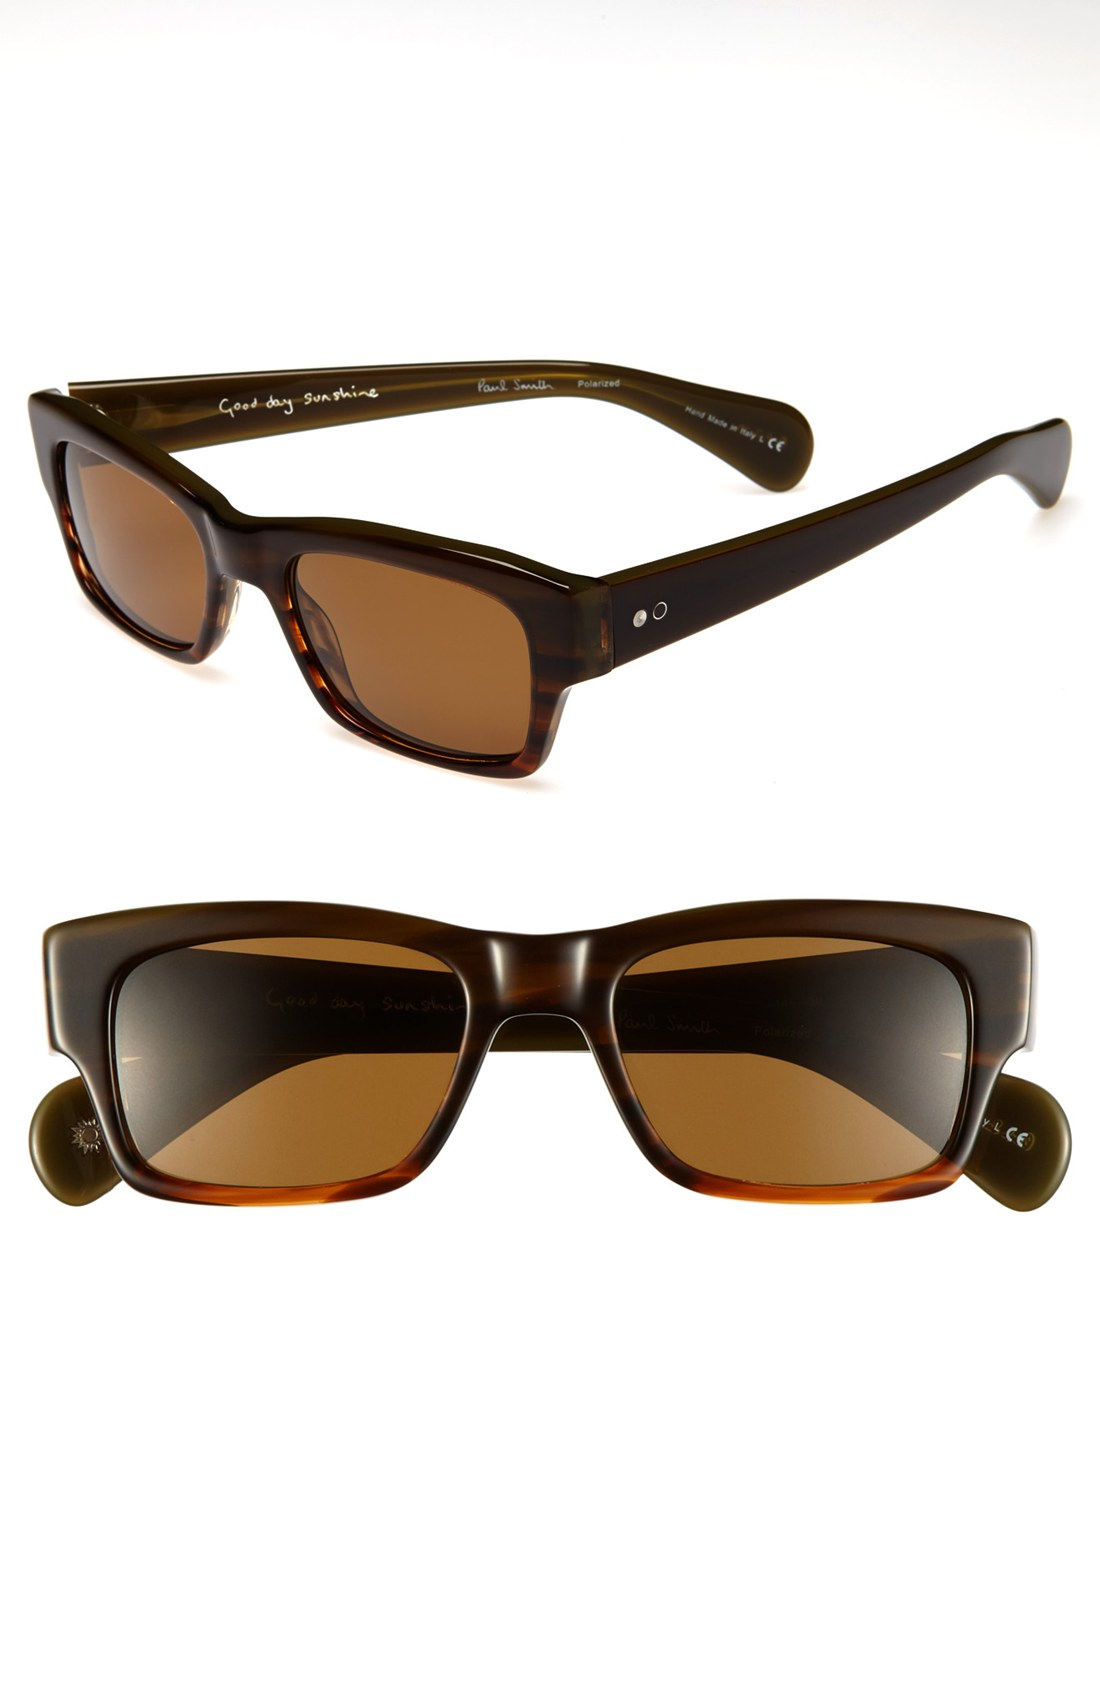 5cd988dd694 Kreed Sunglasses Polarized - Welcome To Miami